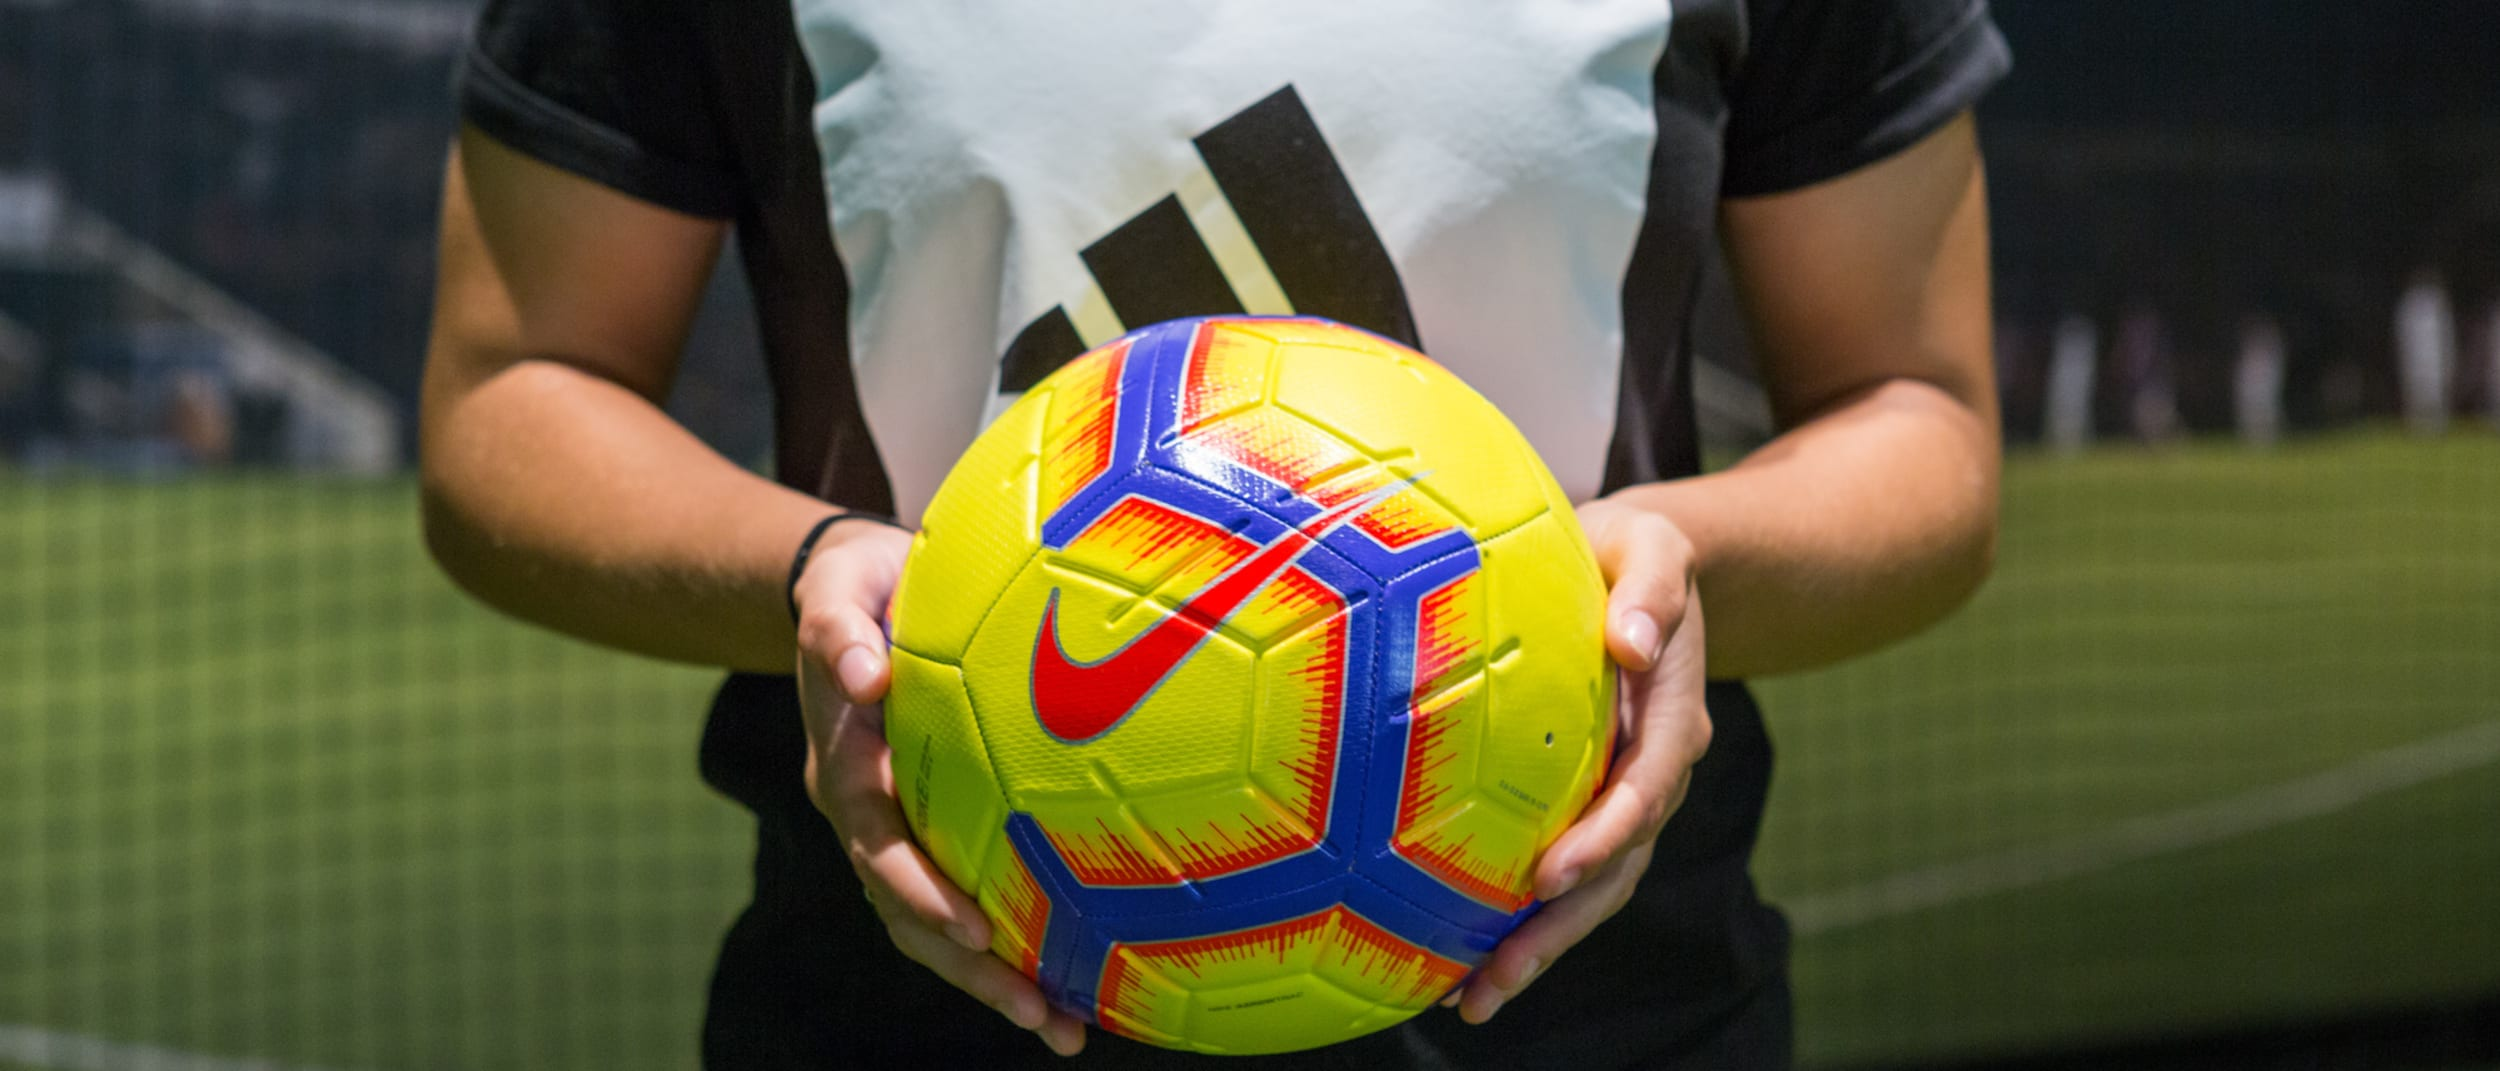 Everything Football skills workshops